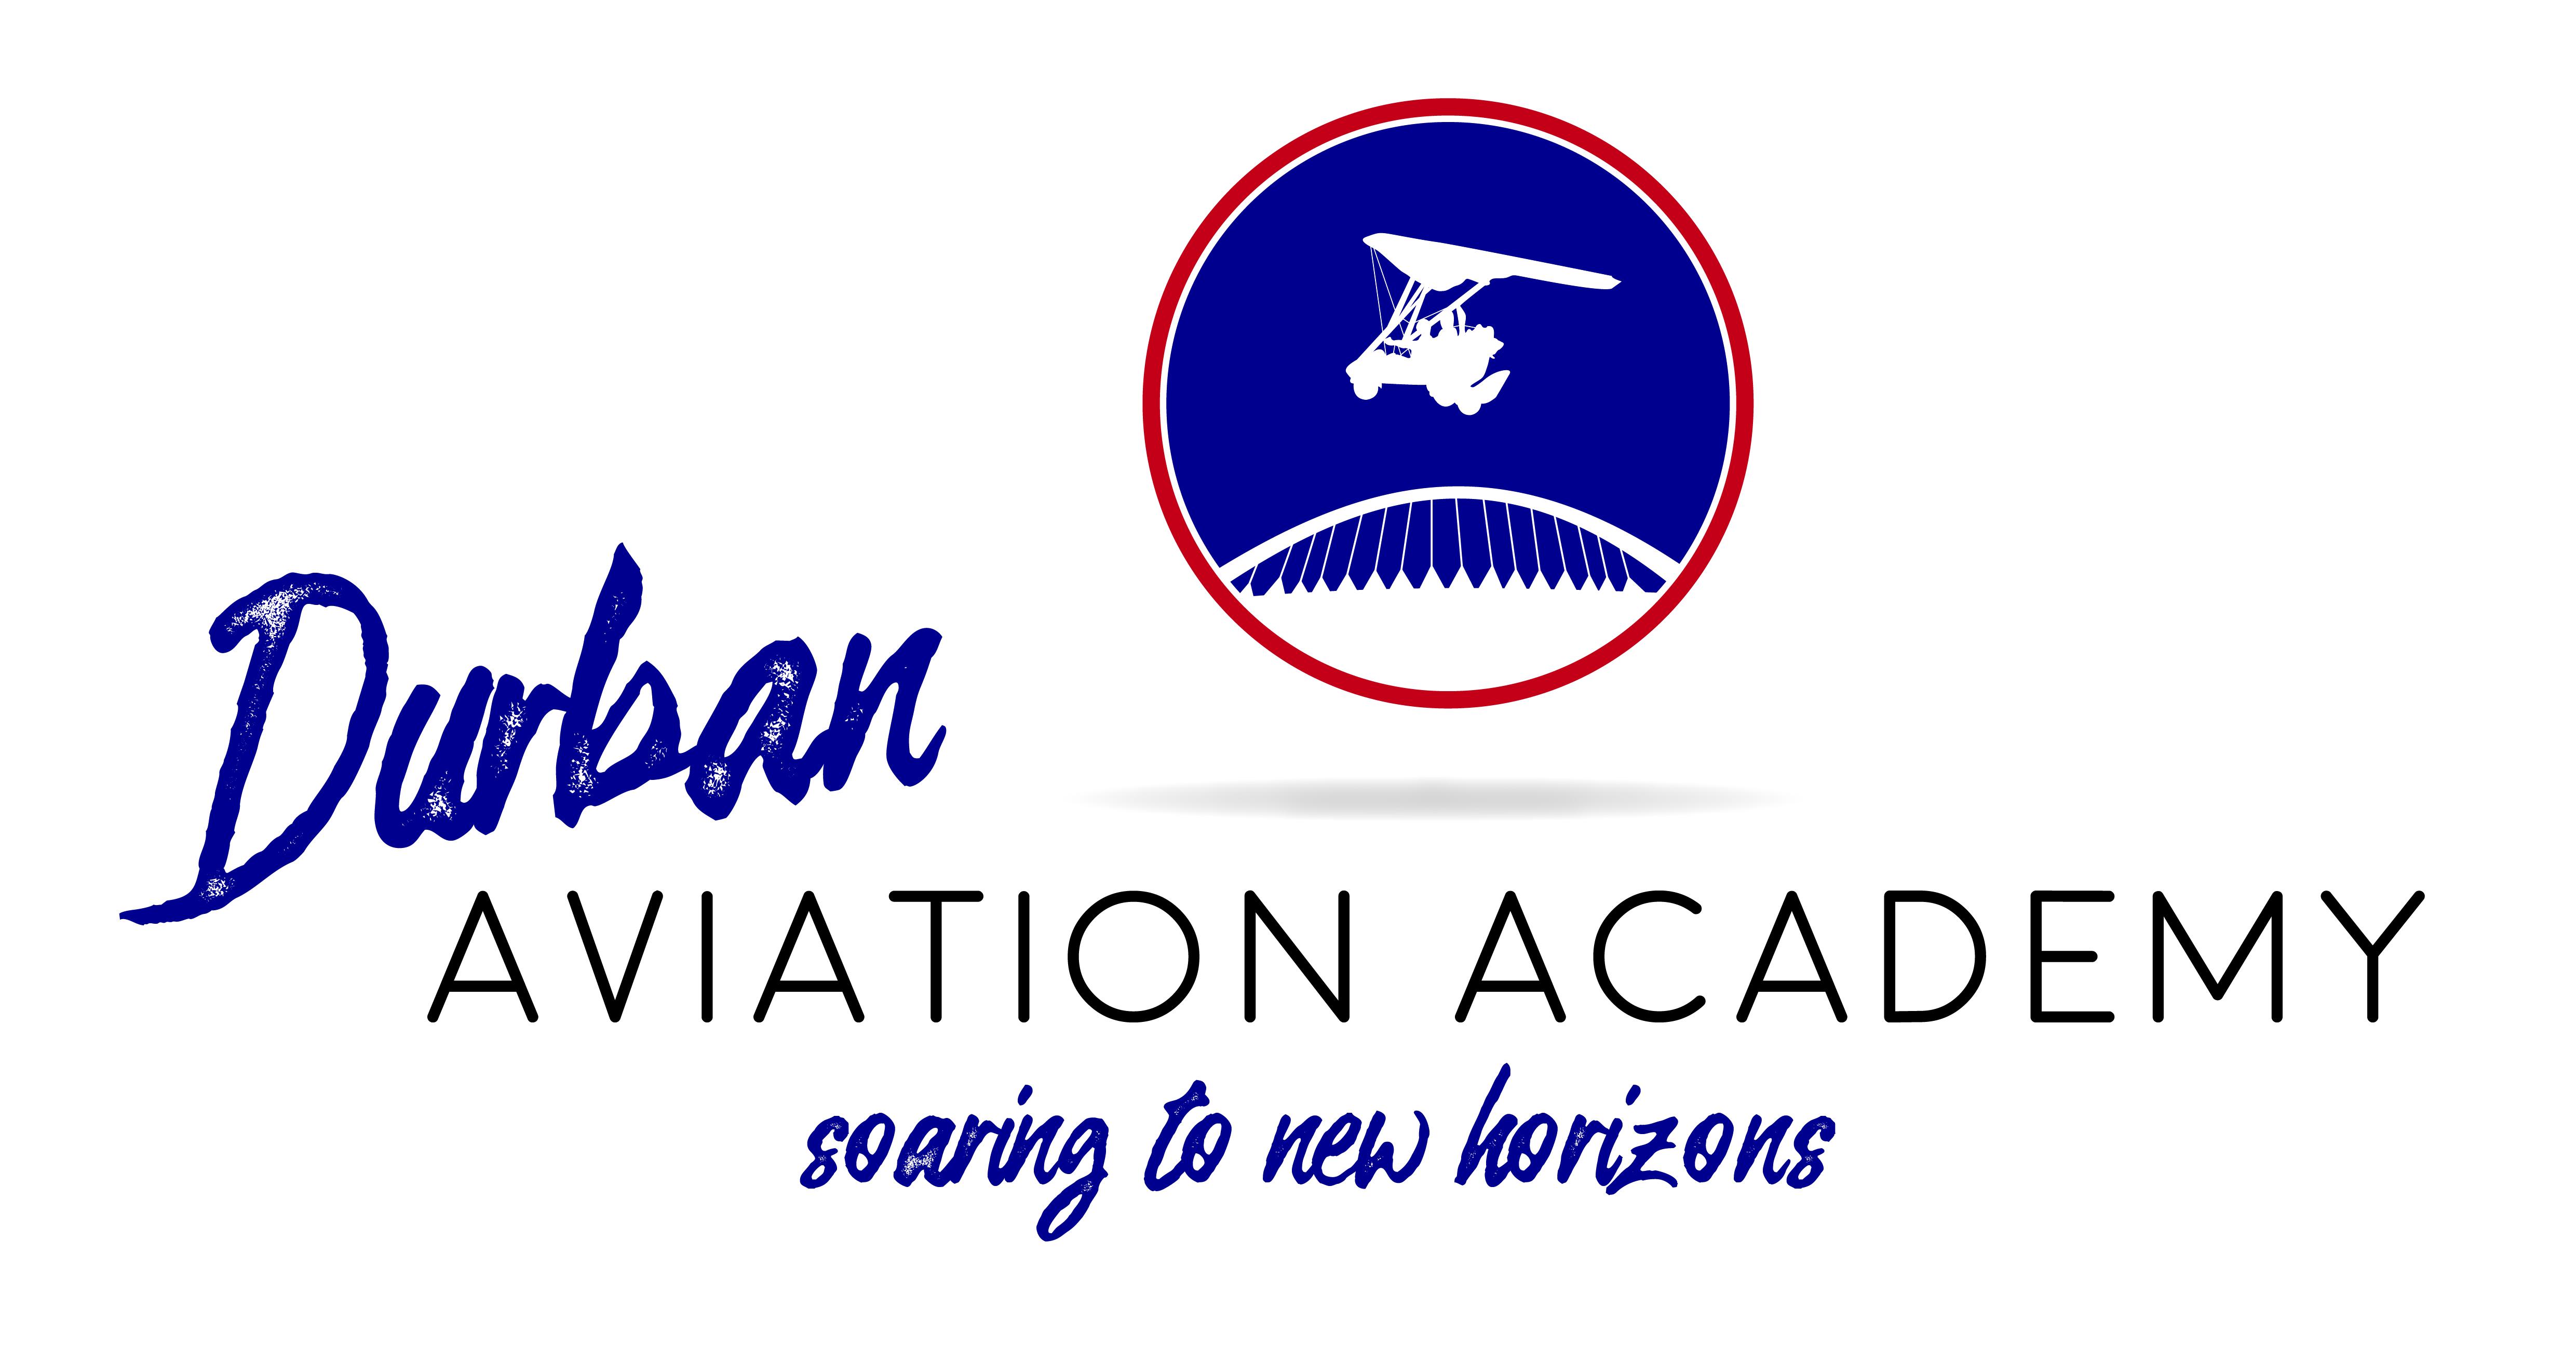 Durban Aviation Academy